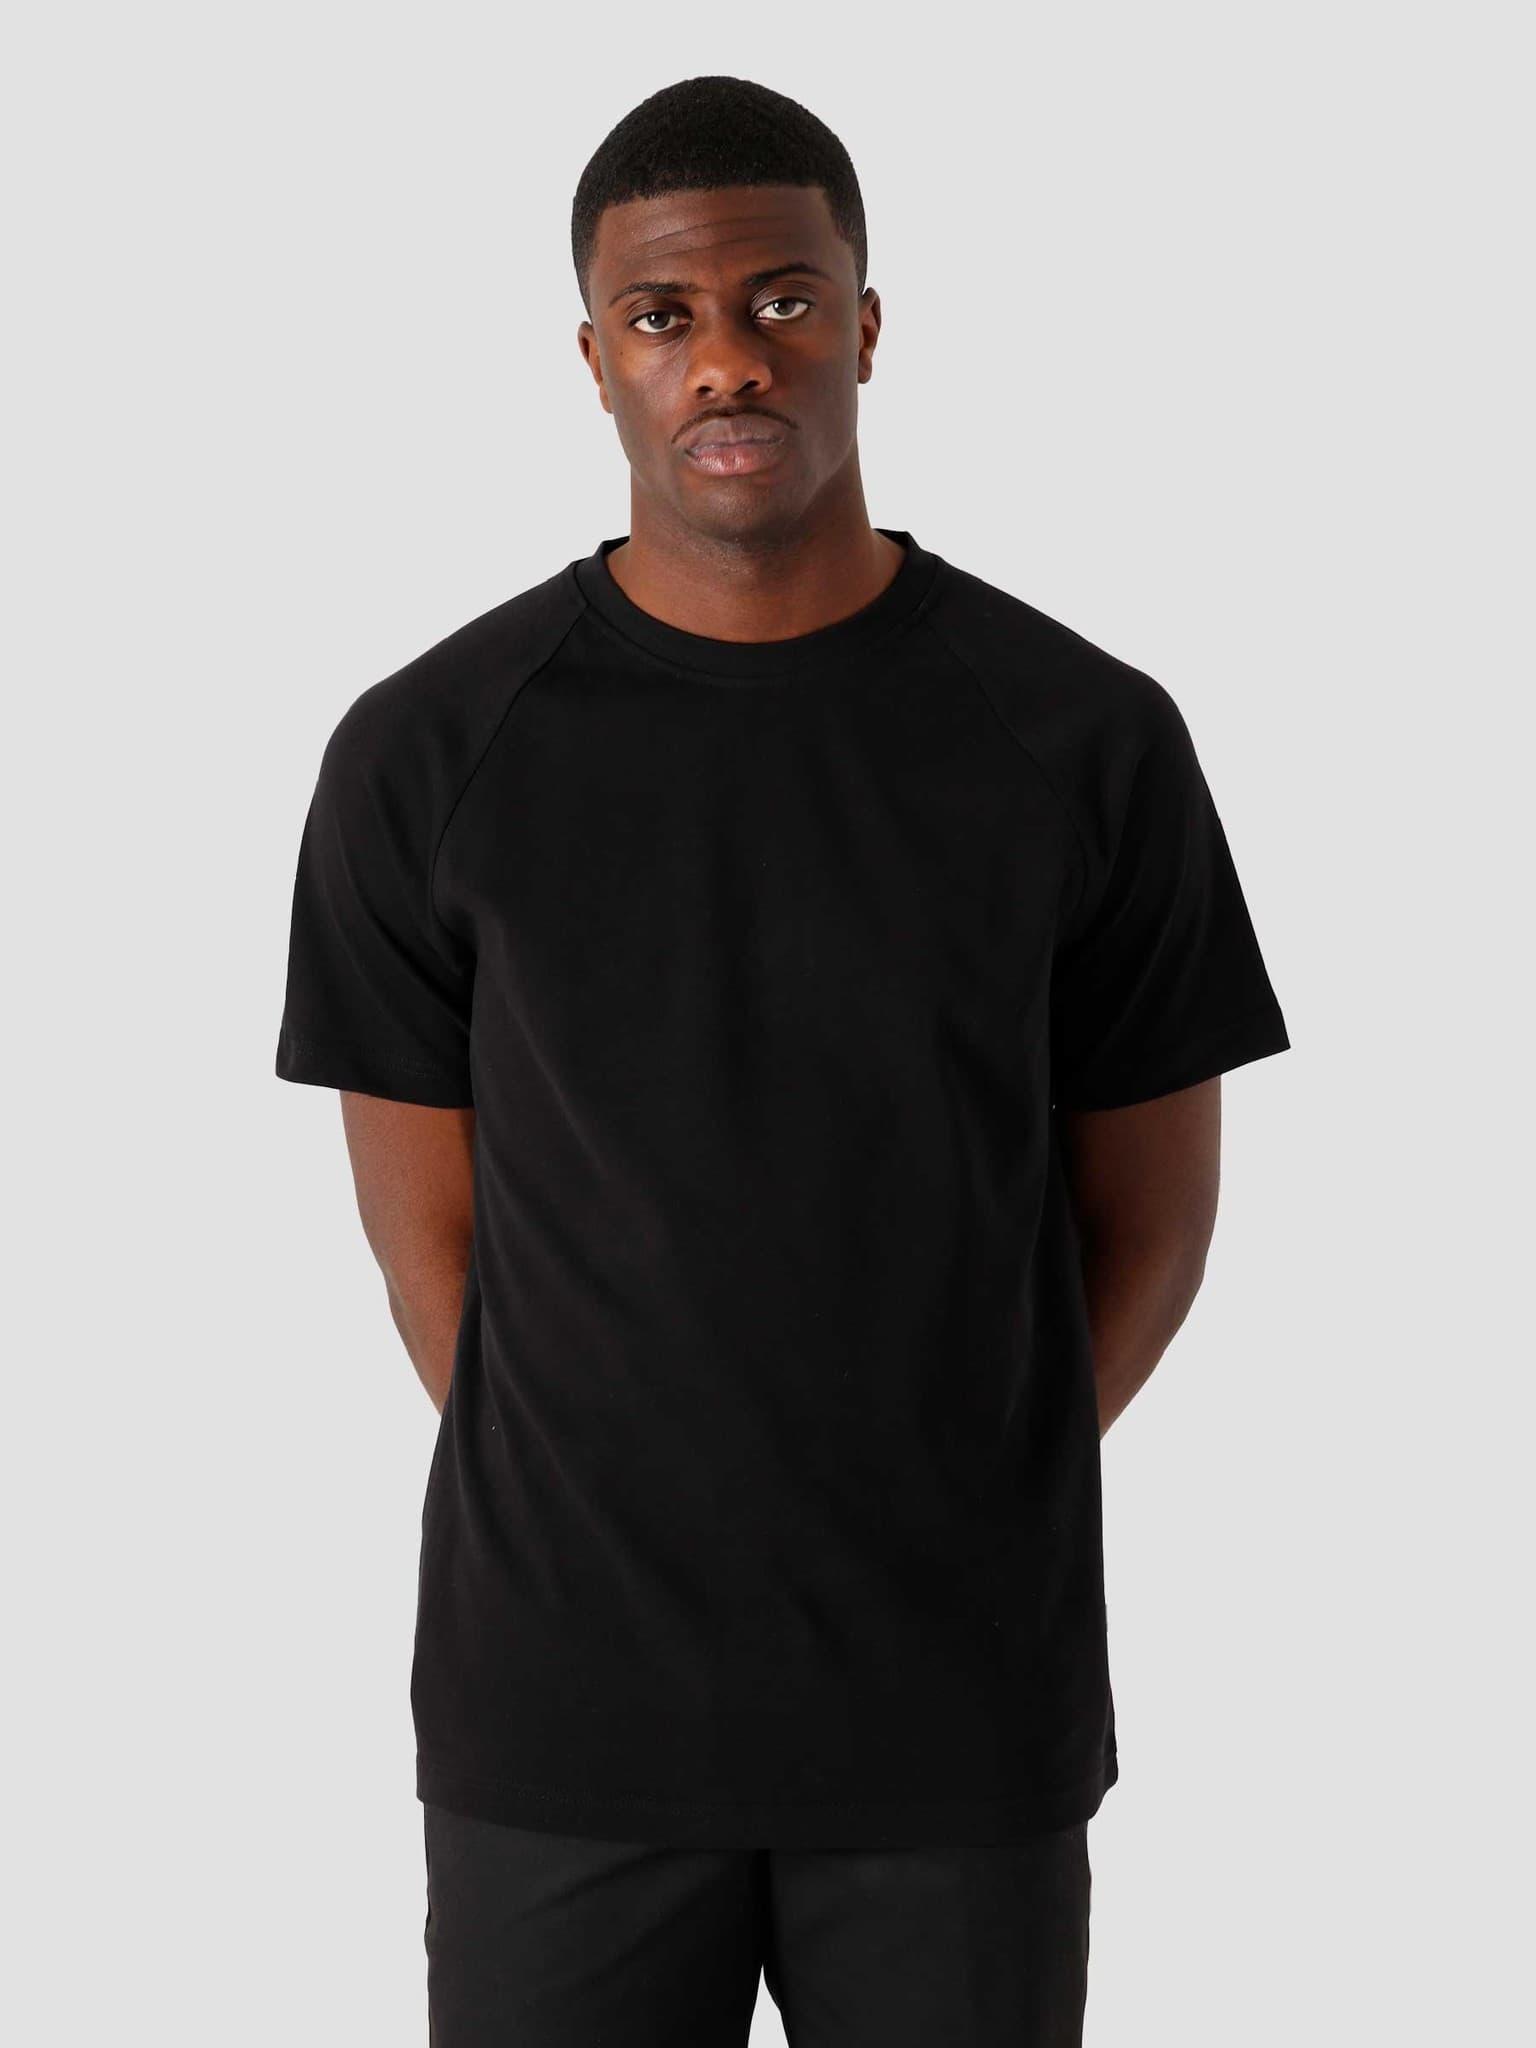 QB302 Heavy Raglan T-shirt Black